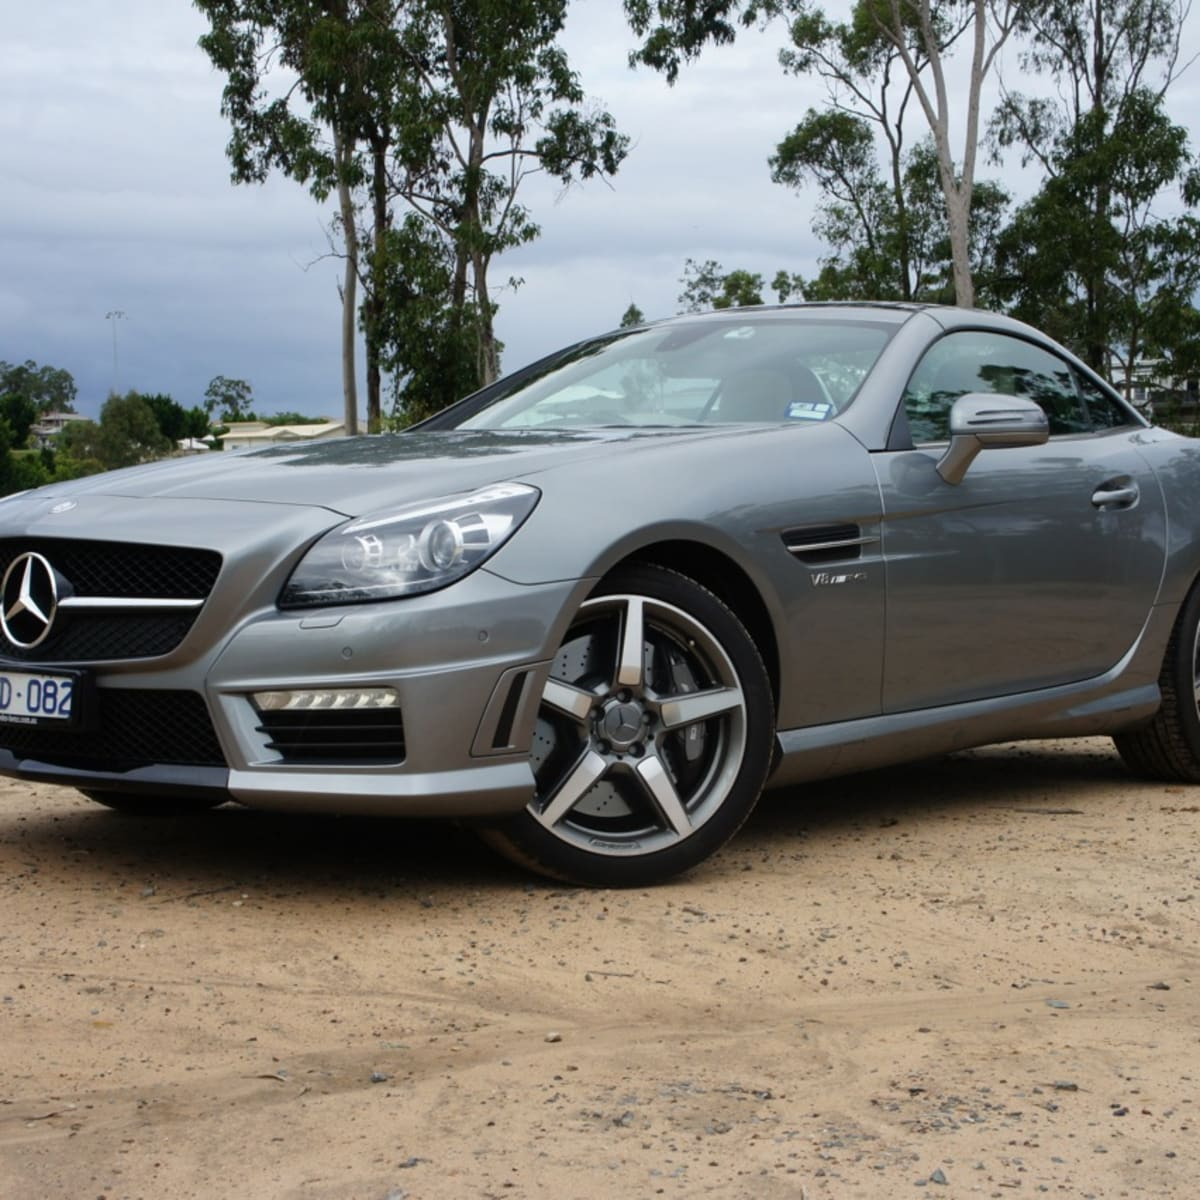 Mercedes Benz Slk55 Amg Review Caradvice